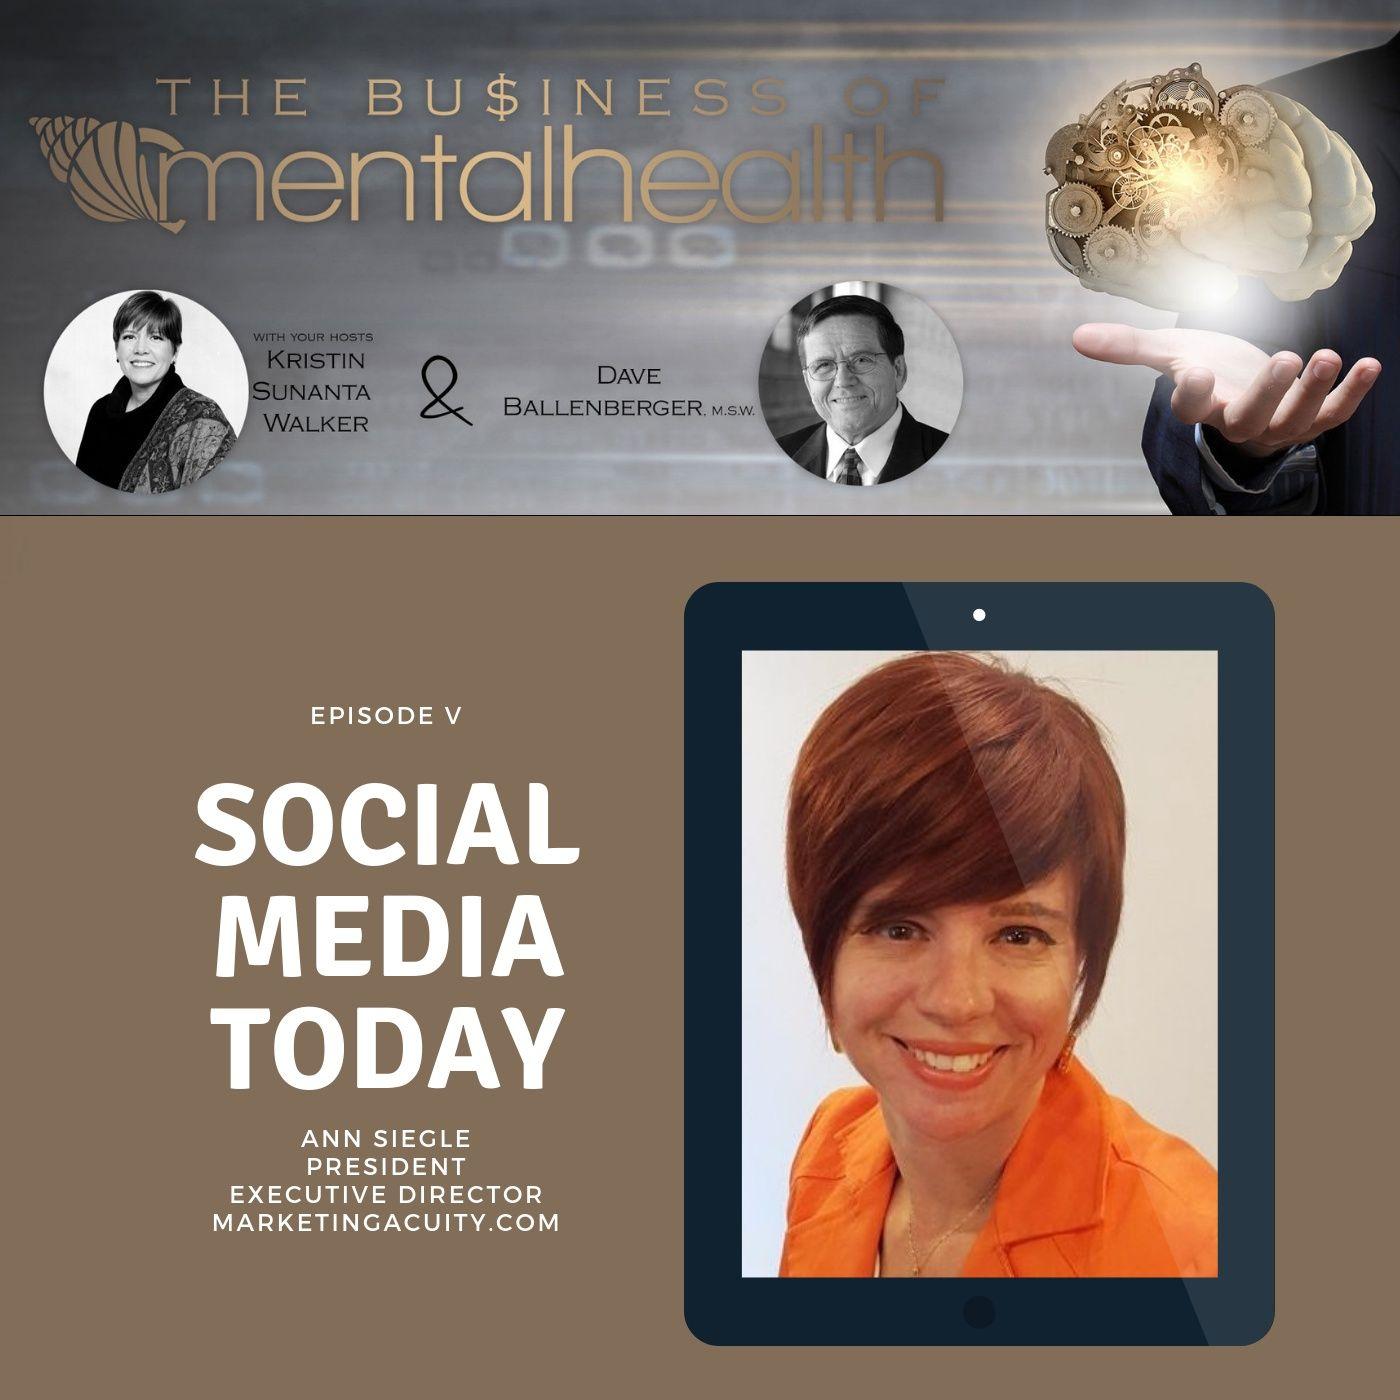 Mental Health News Radio - Mental Health Business: Social Media Today